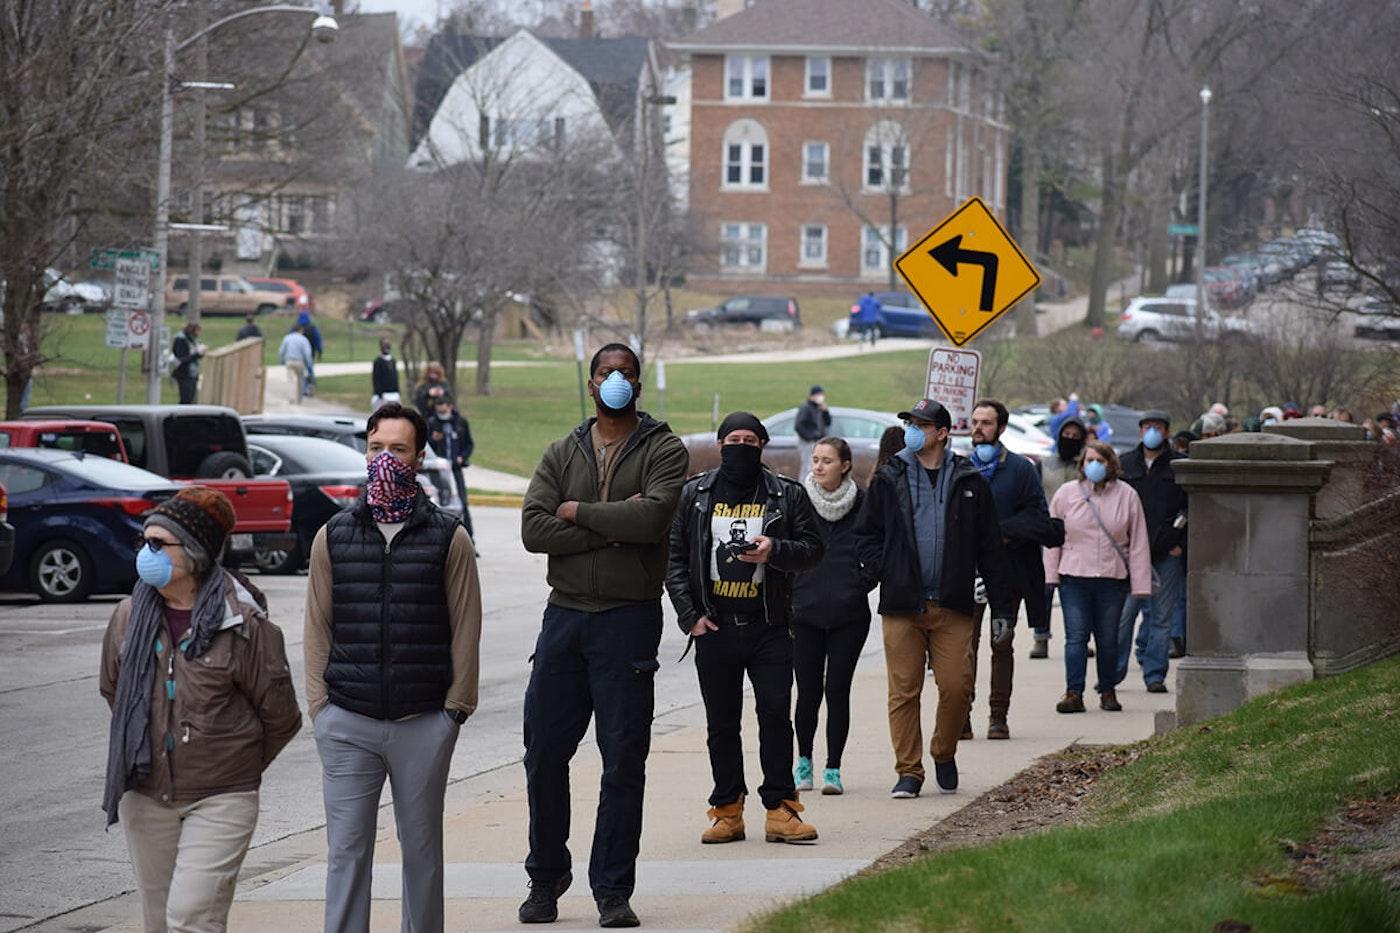 Voters wait in line on April 7 outside Riverside High School in Milwaukee. (Photo by Jonathon Sadowski)